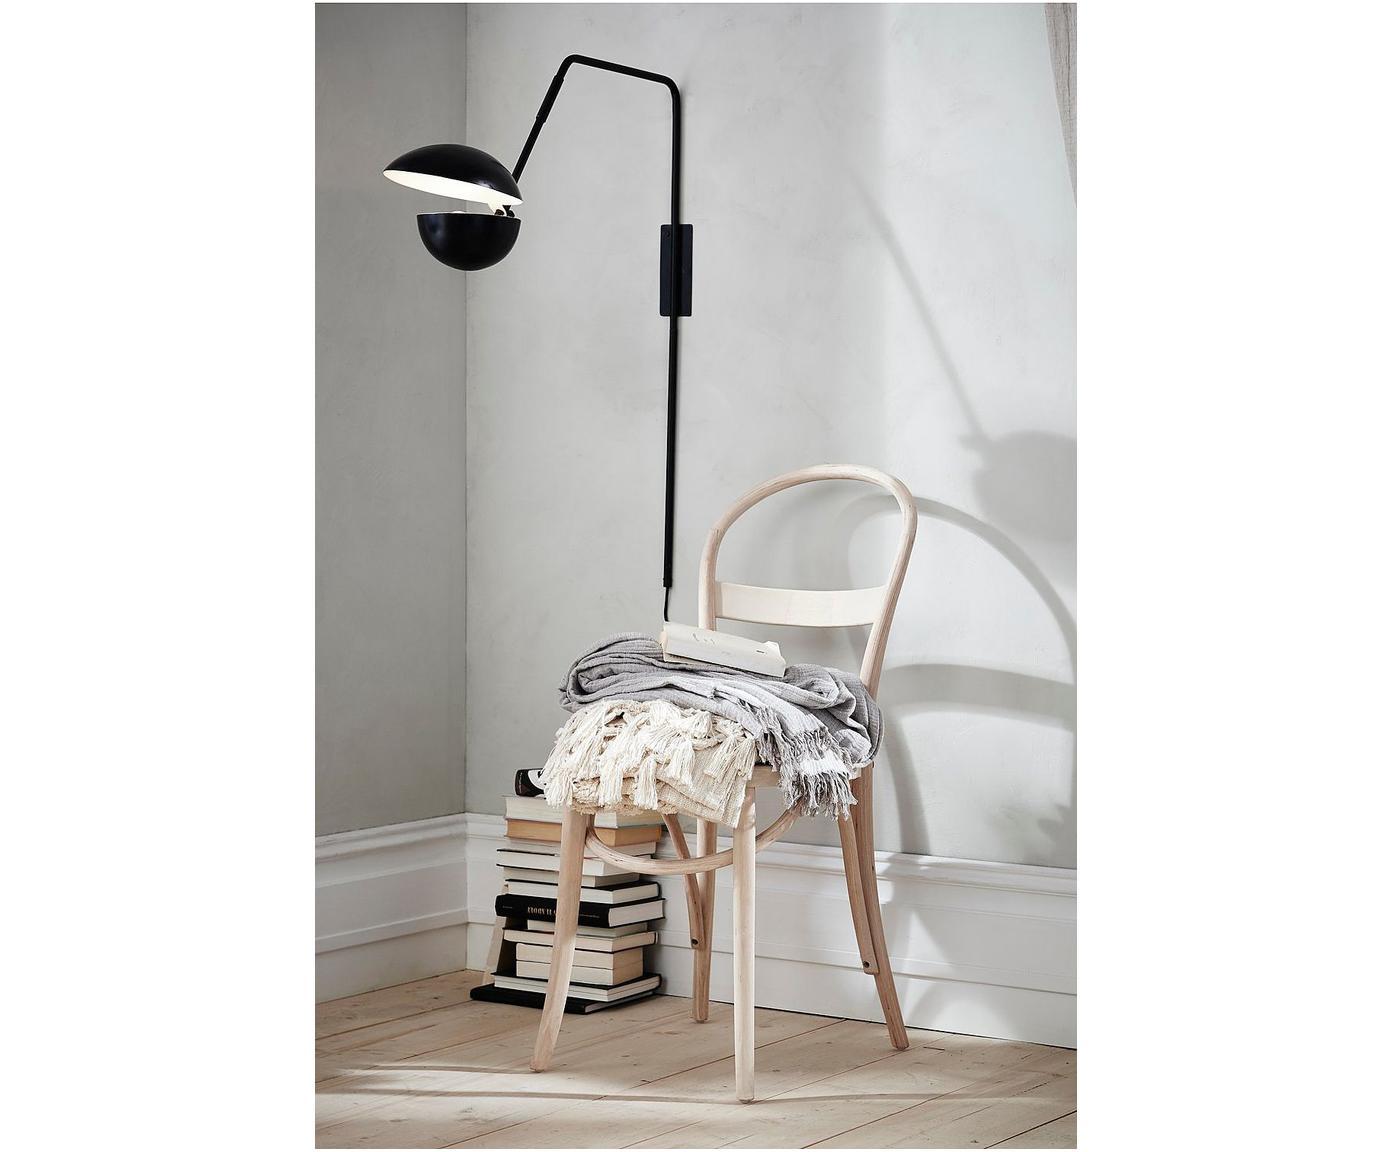 Sedia in legno Rippats, 2 pz., Struttura: legno di betulla, Seduta: rattan, Betulla, Larg. 39 x Prof. 53 cm